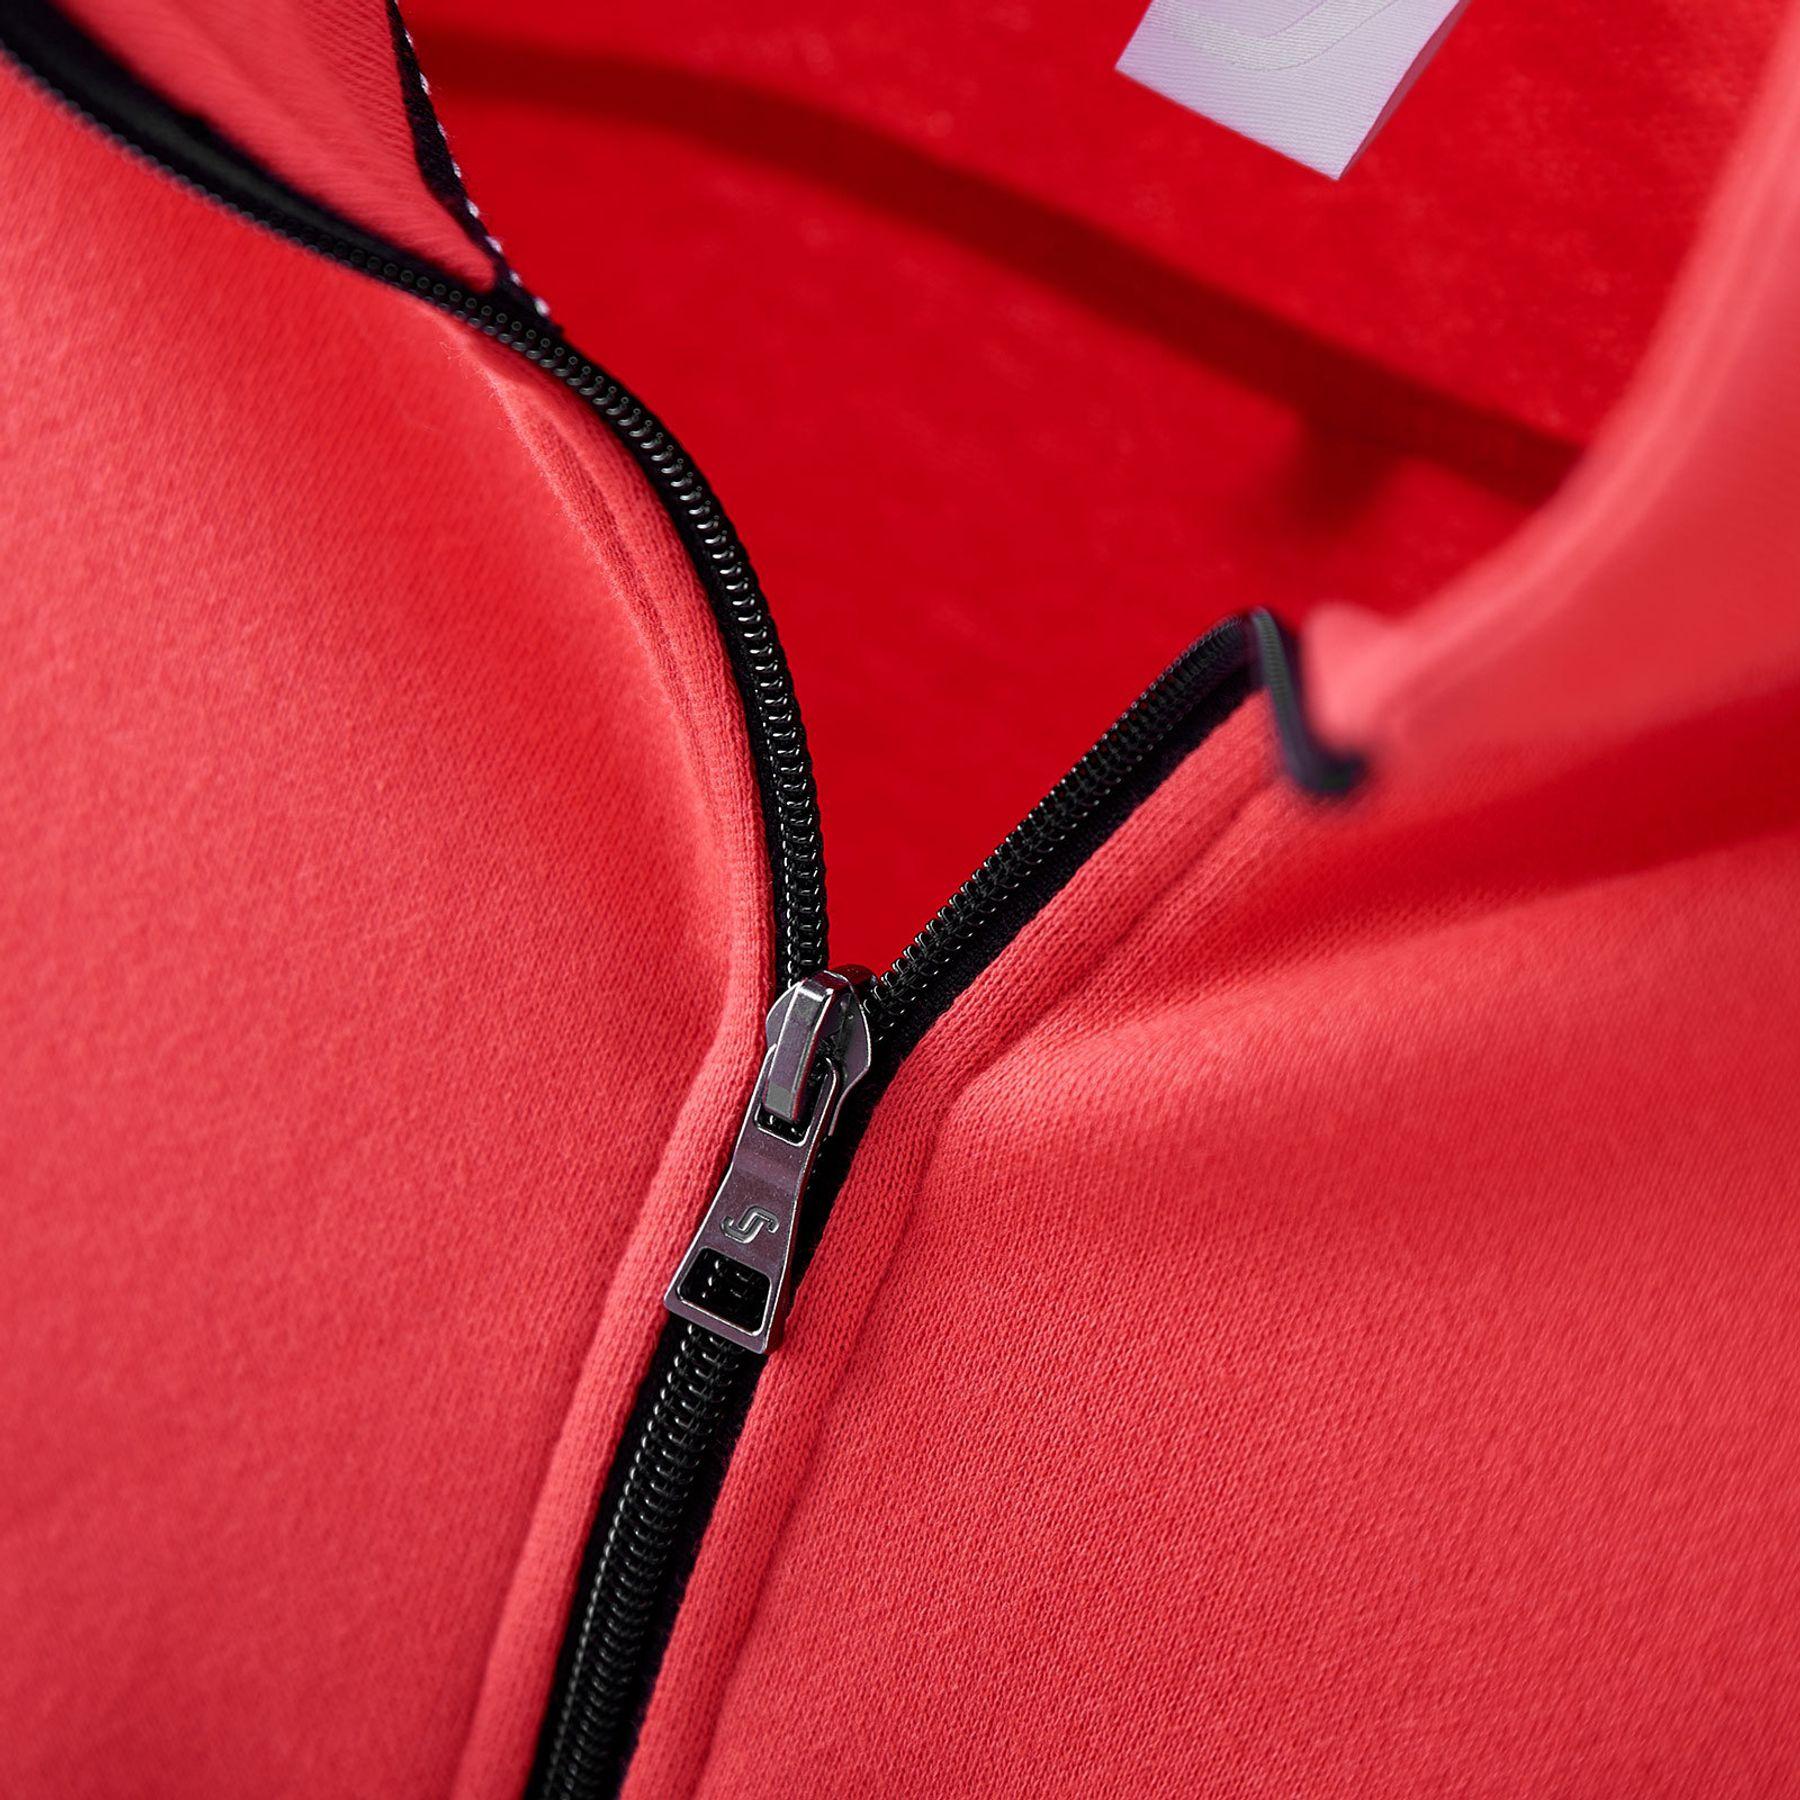 Joy - Damen Sport und Freizeit Jacke in mehreren Farben, Paulina (34500) – Bild 15